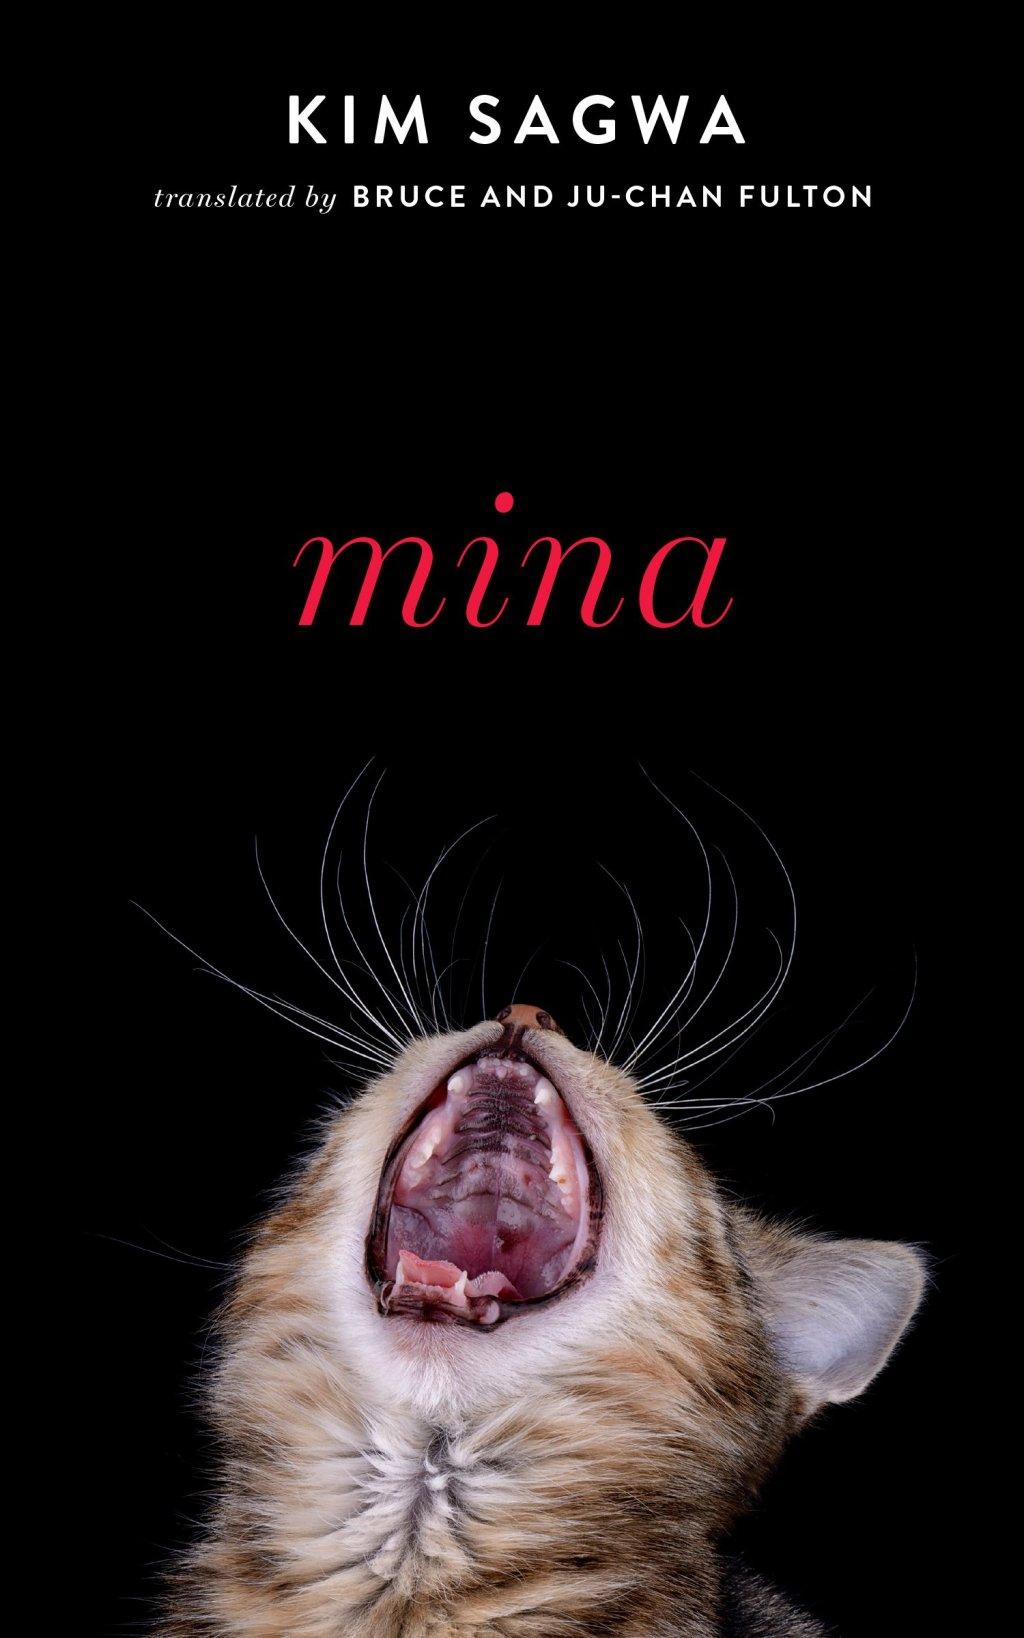 Mina, Kim Sagwa, Bruce Fulton (trans), Ju-Chan Fulton (trans) (Two Lines Press, October 2018)